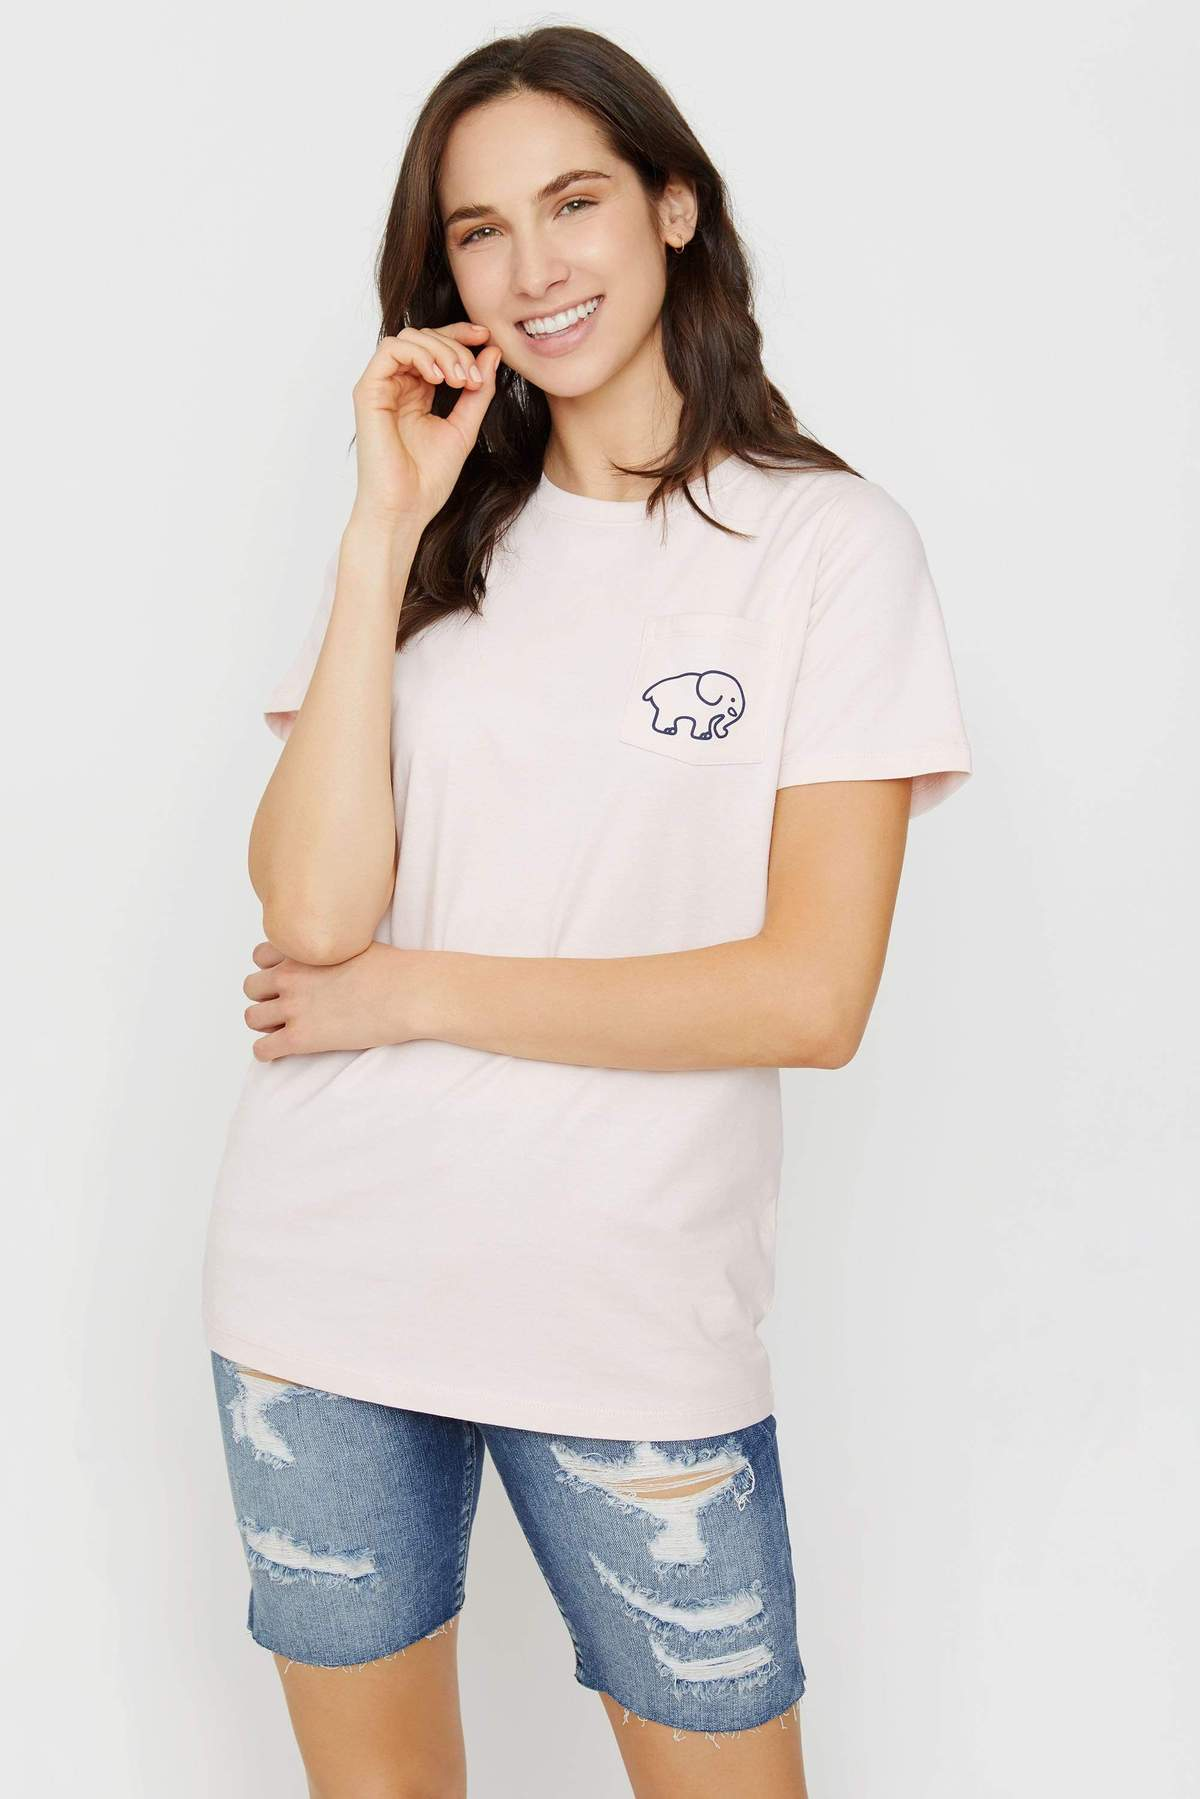 ivory-ella-women-s-short-sleeve-tees-xxs-ella-fit-crystal-pink-cat-coq-seahorse-6633347973235_1200x.jpg